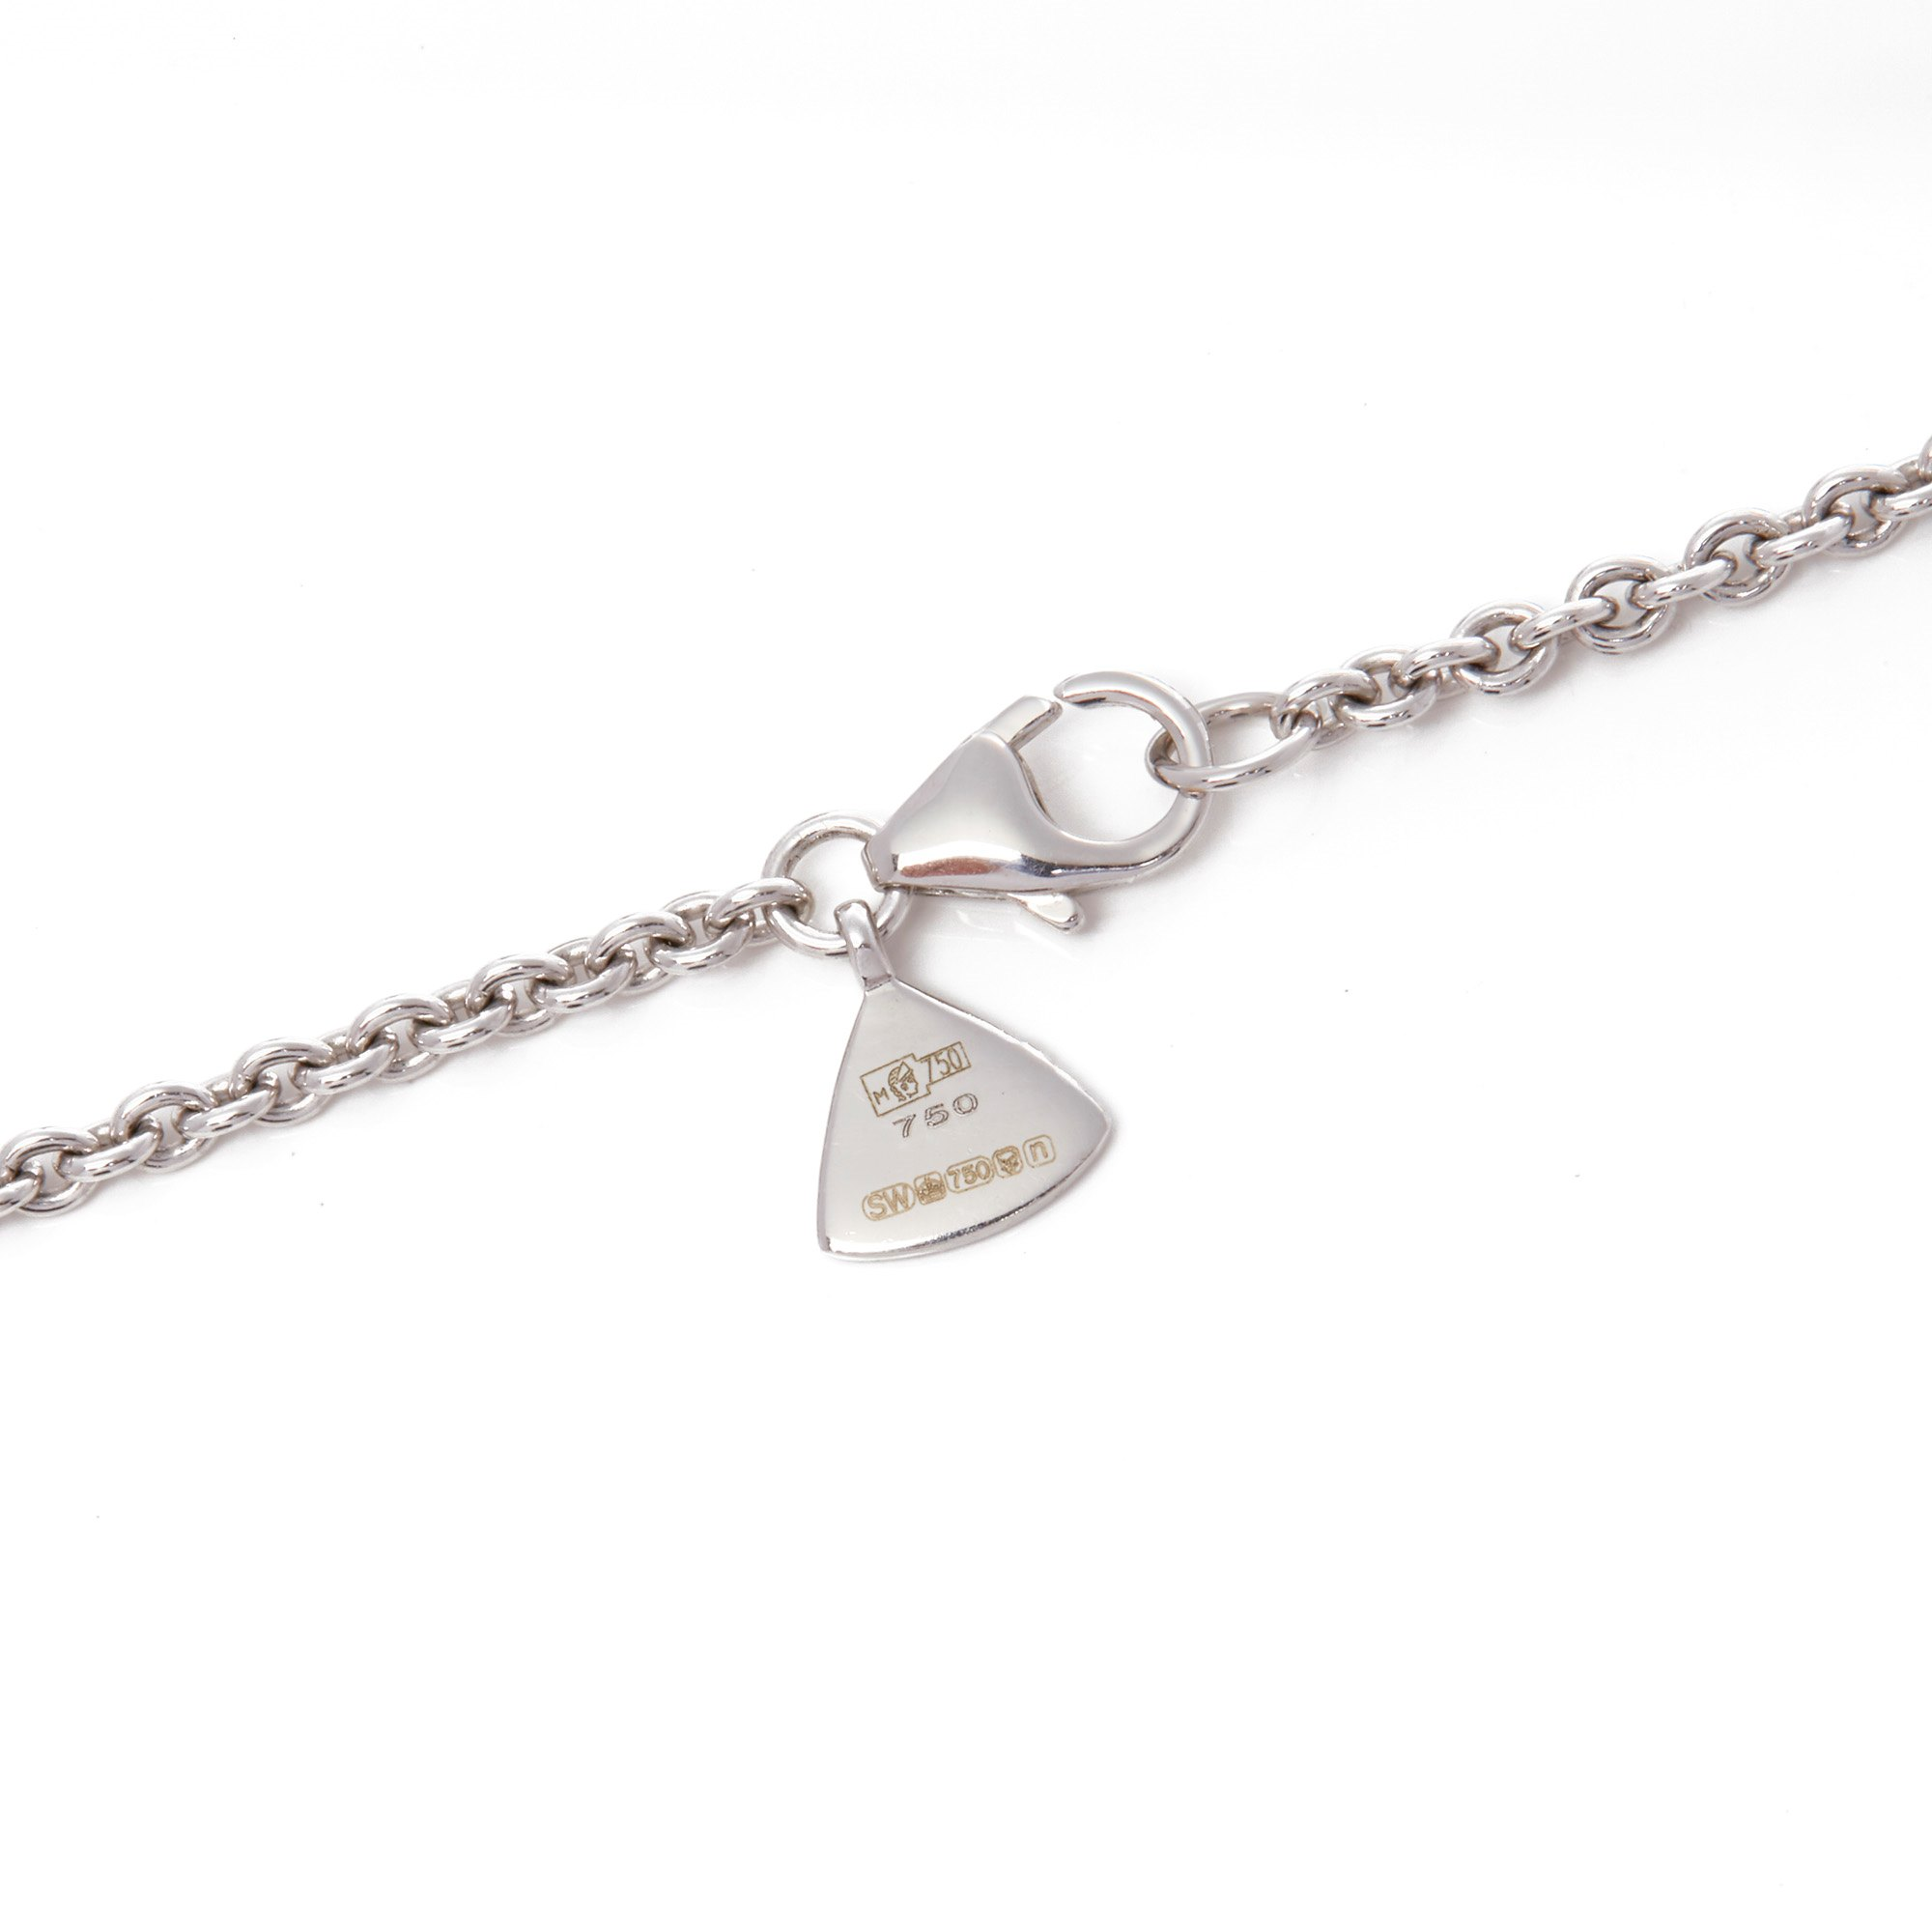 Stephen Webster Deco Haze 18ct Gold Diamond and Hematite Quartz Crystal Haze Necklace